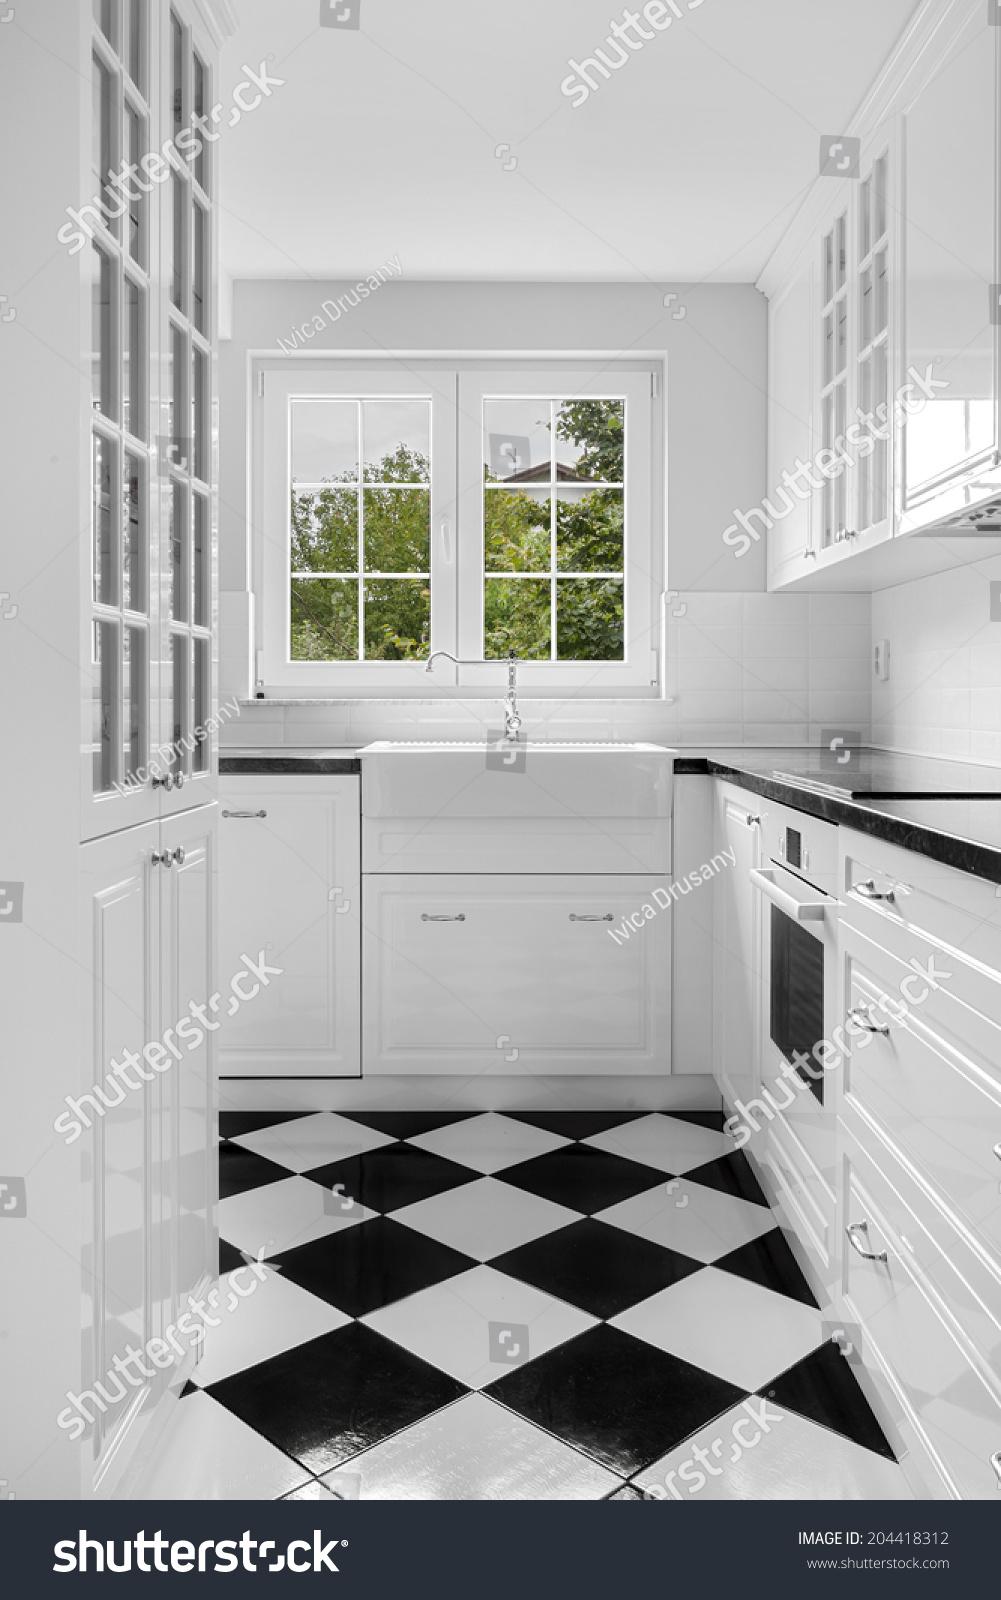 https www shutterstock com image photo new black white kitchen retro details 204418312